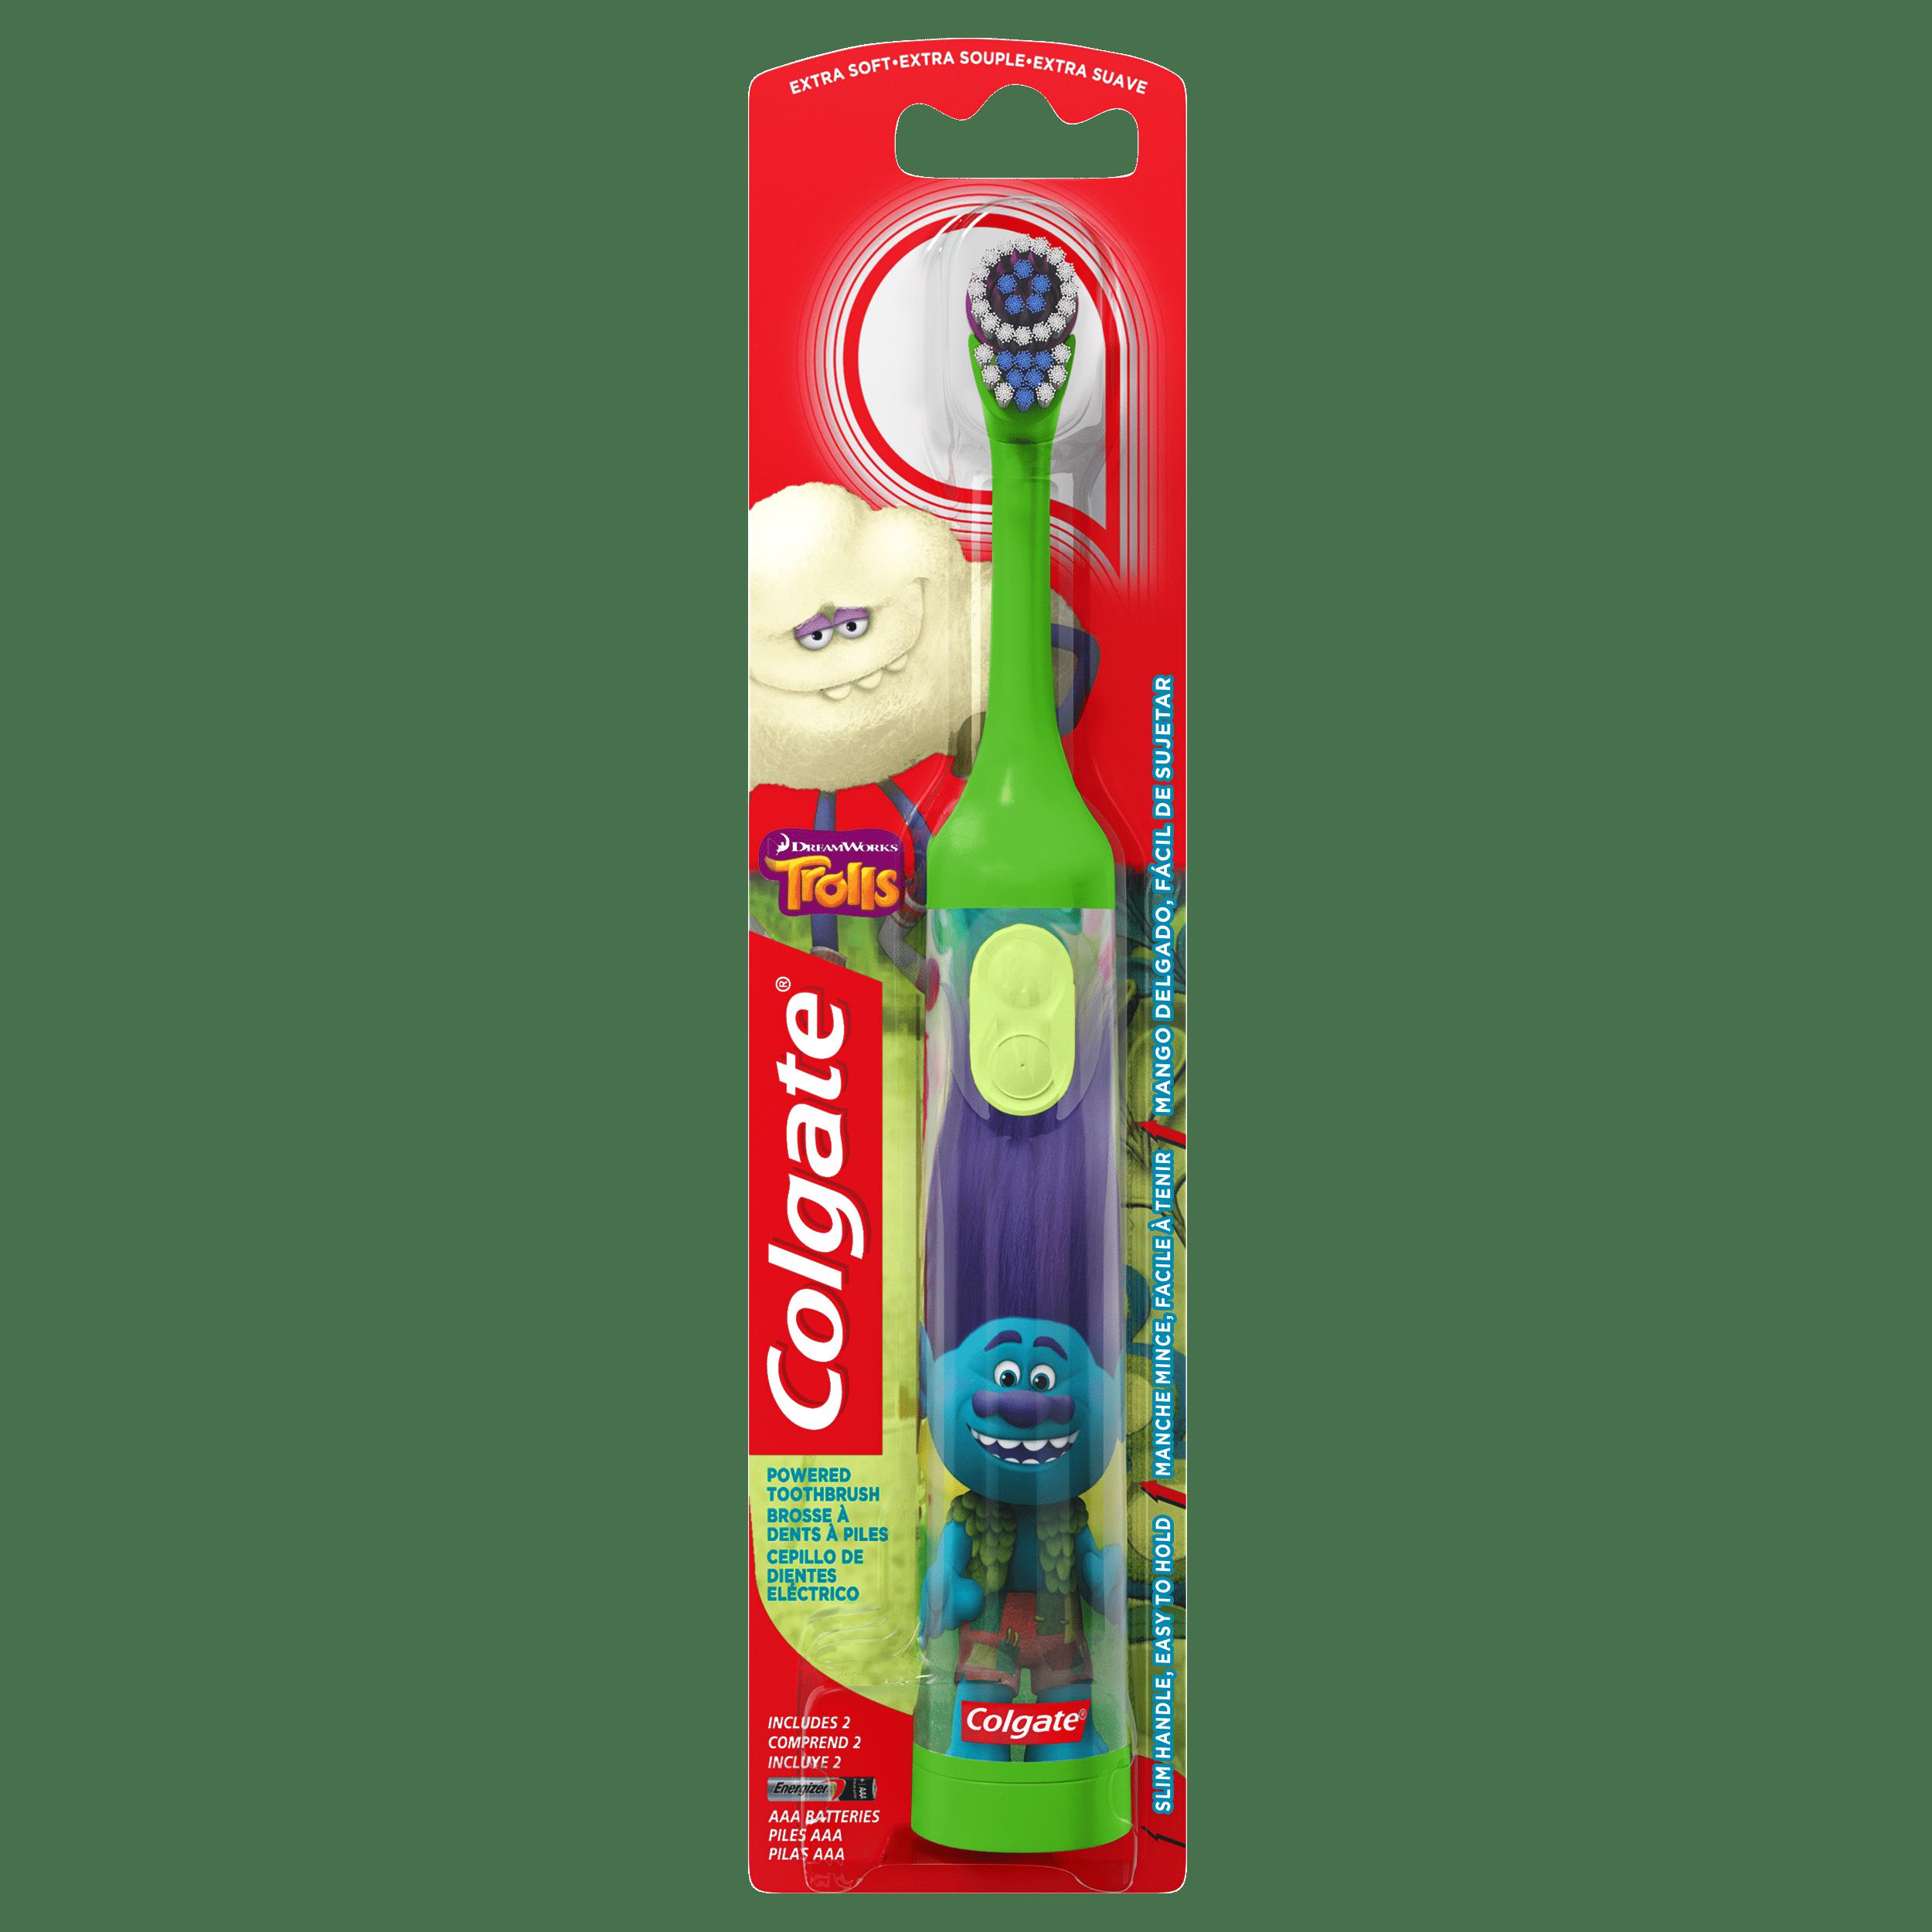 Colgate Kids Battery Powered Toothbrush - Trolls (Colors Vary)